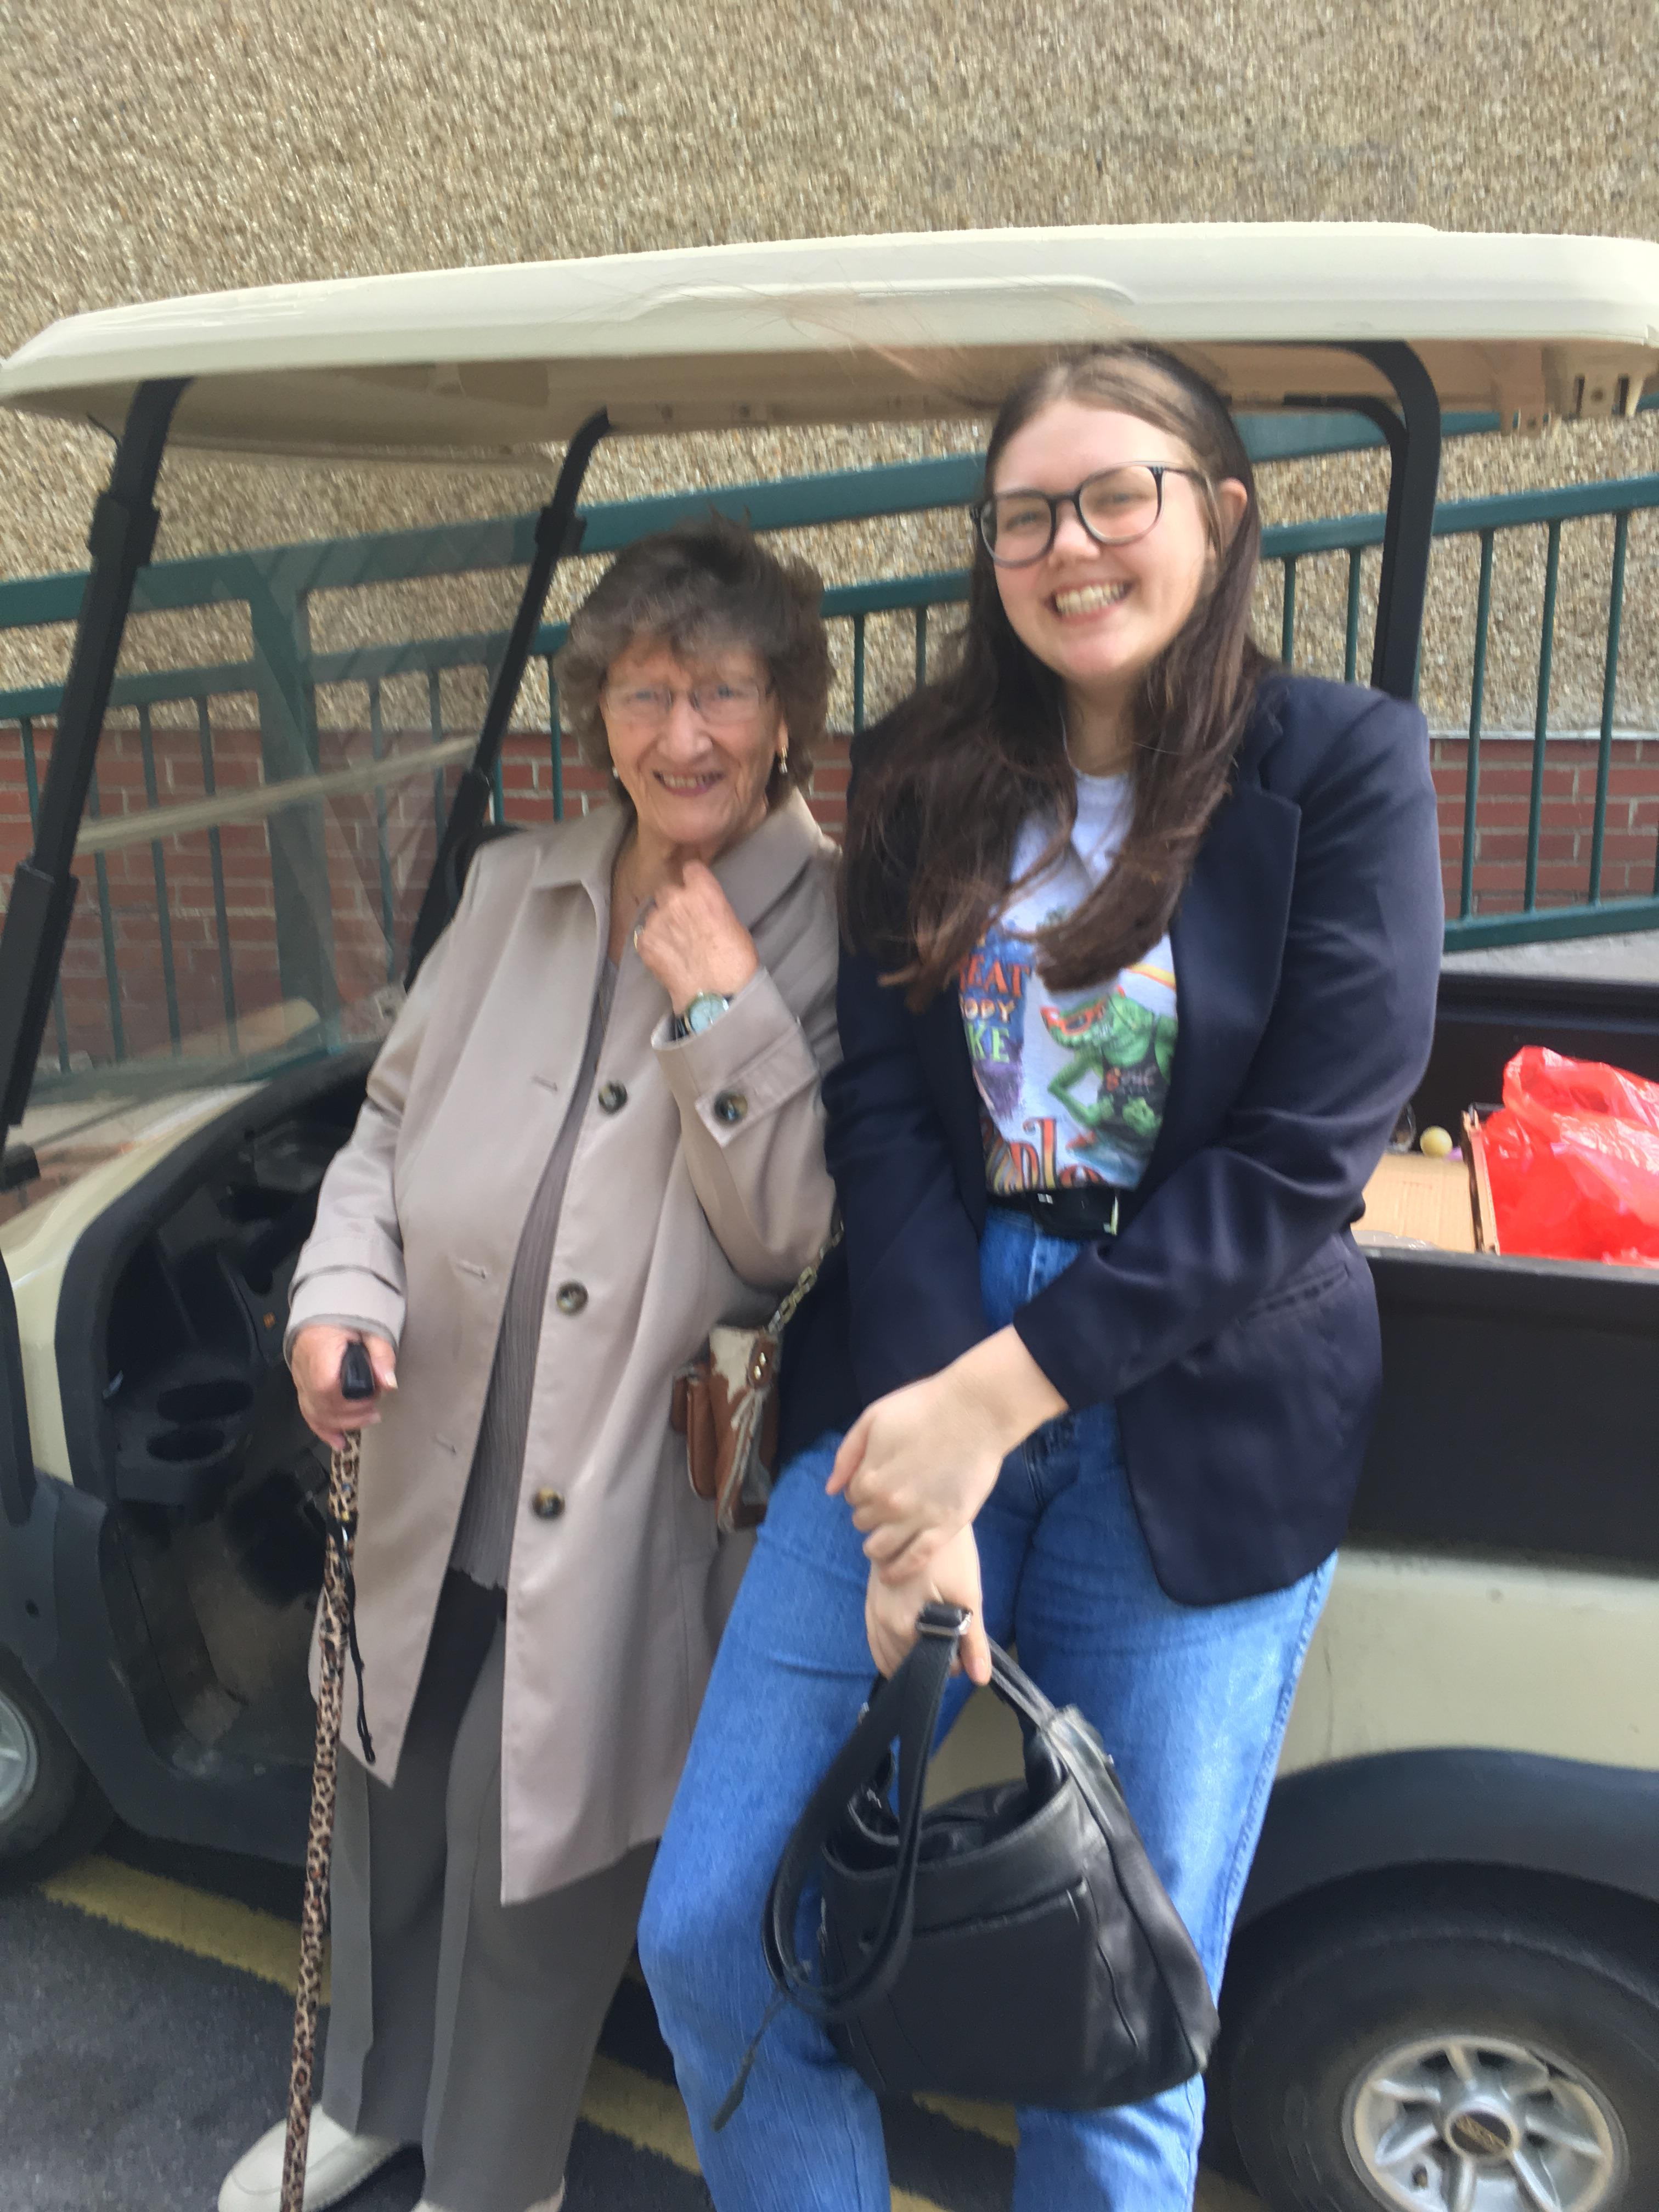 A Photo with Former Newton Aycliff Mayor Lyn Leach, Resident of Middridge and Friend of Grandma